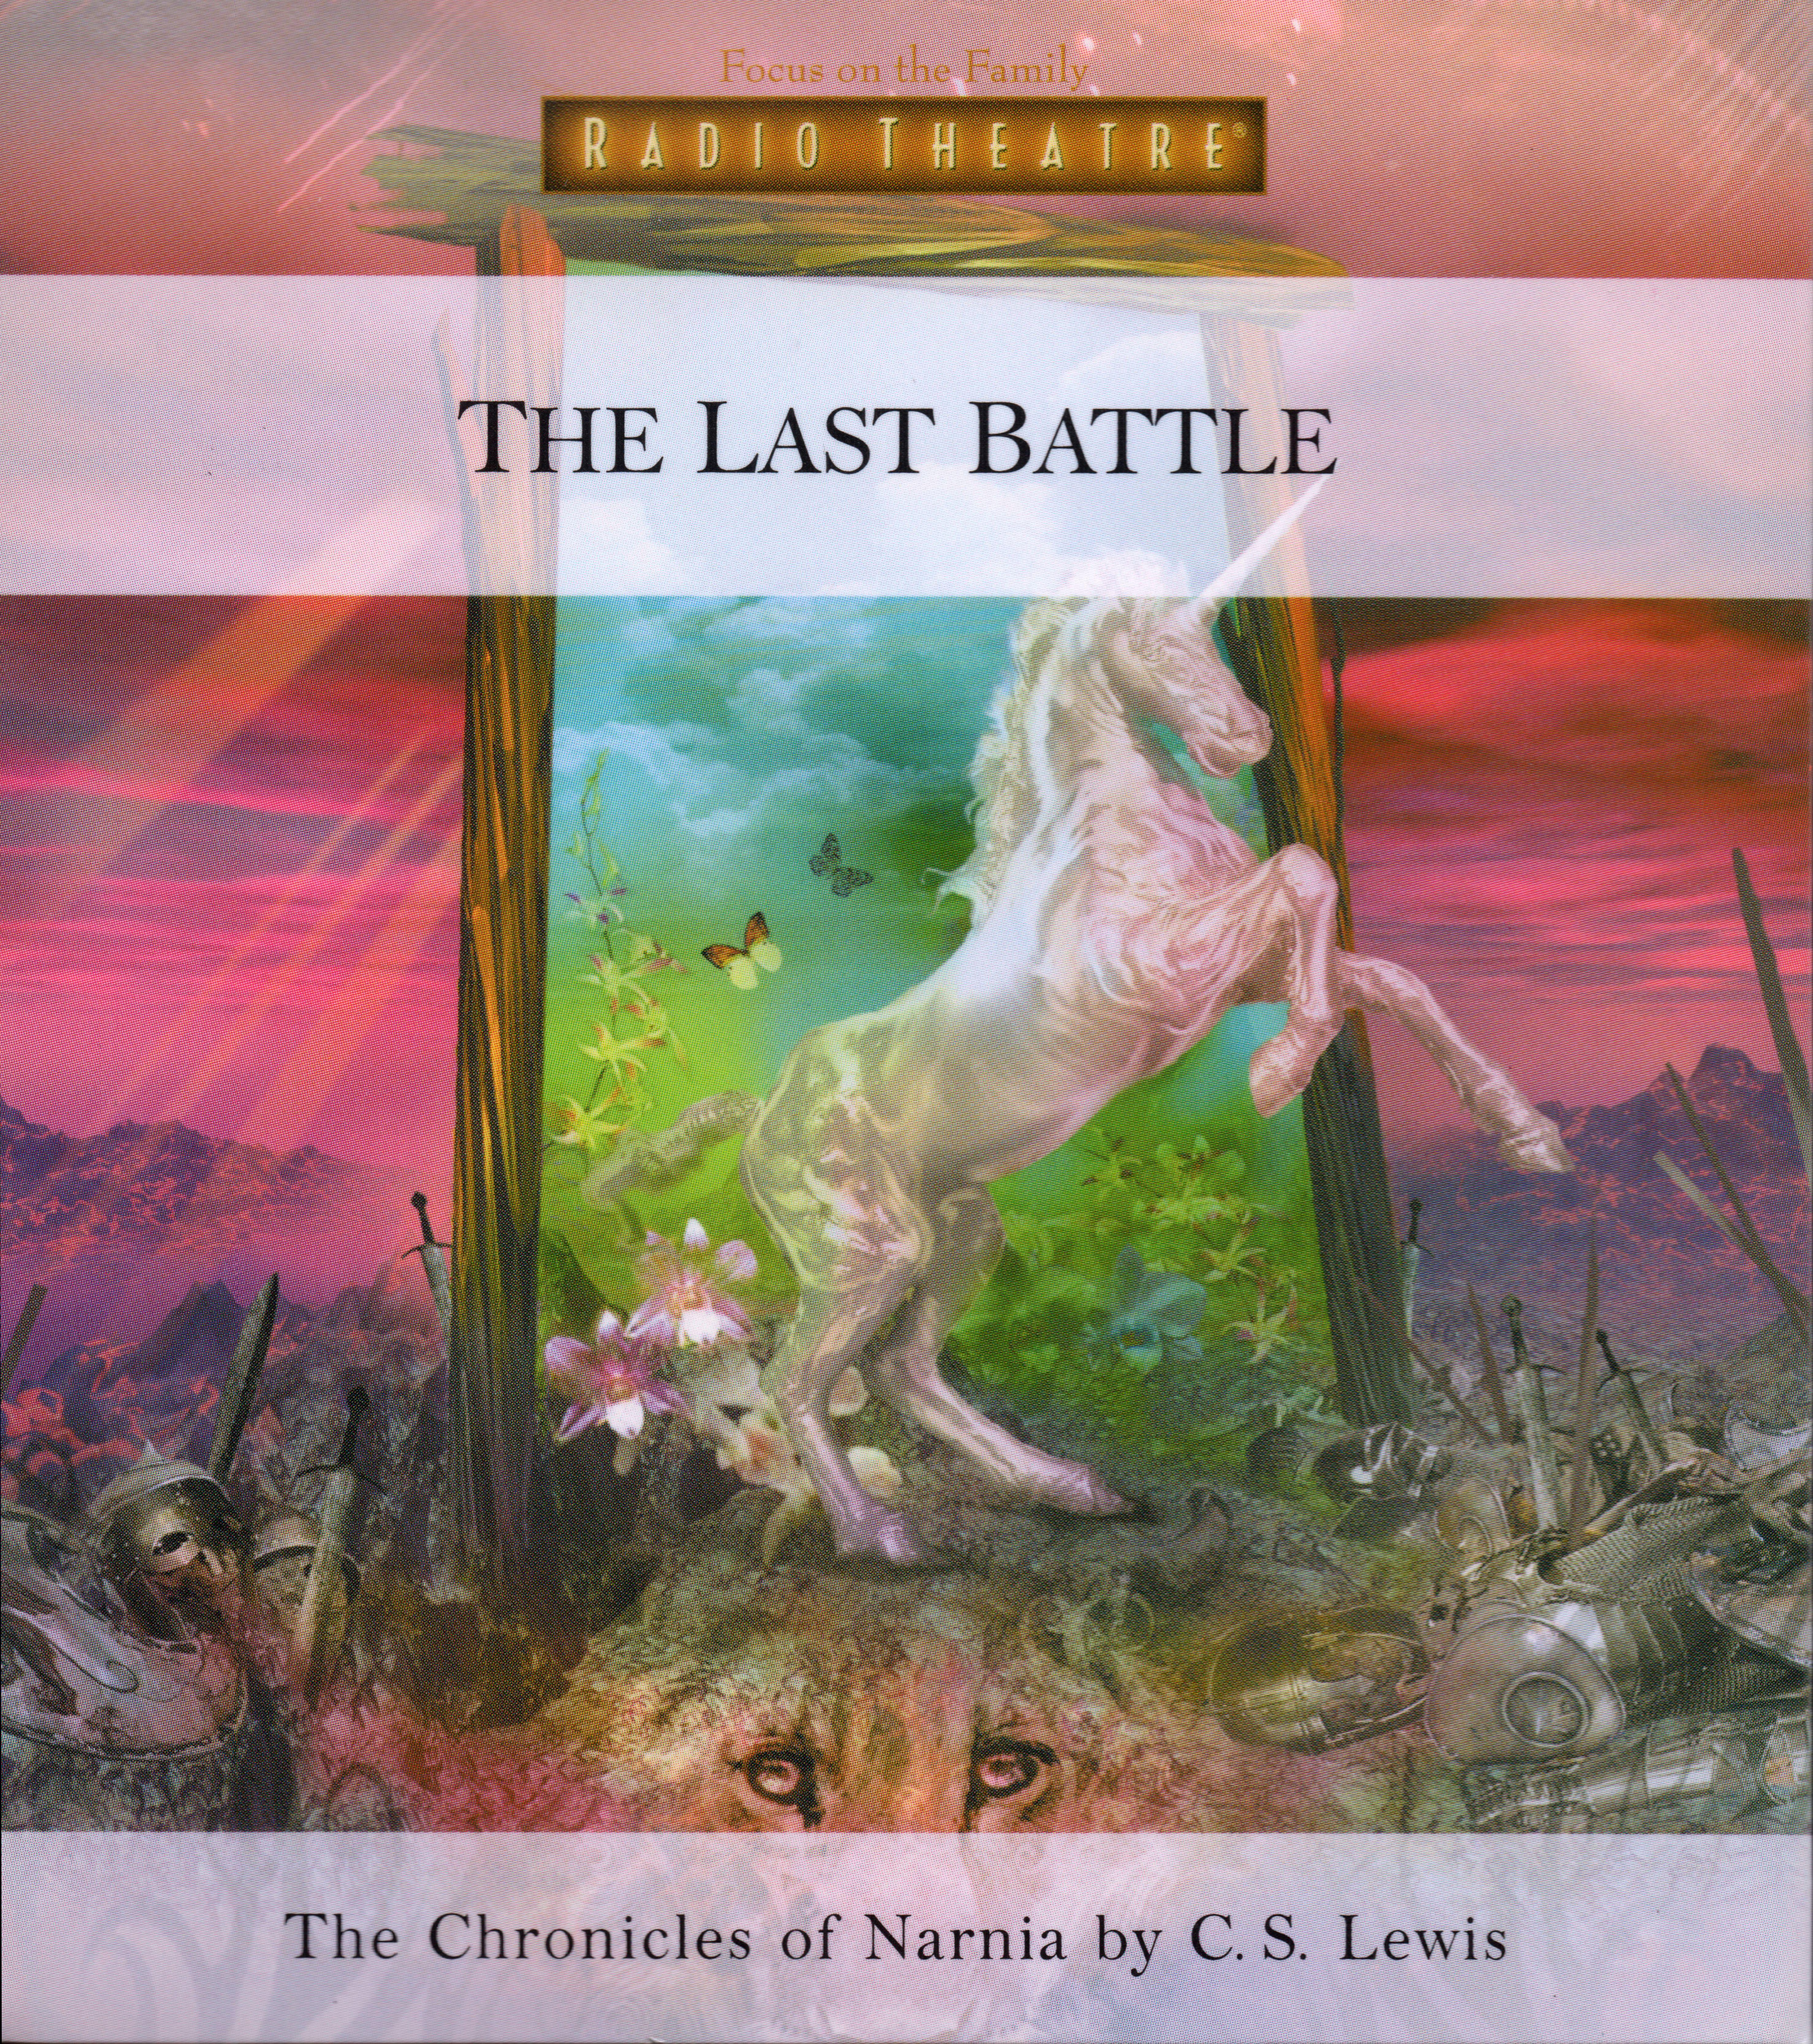 The Last Battle (Focus of the Family Radio Theatre)